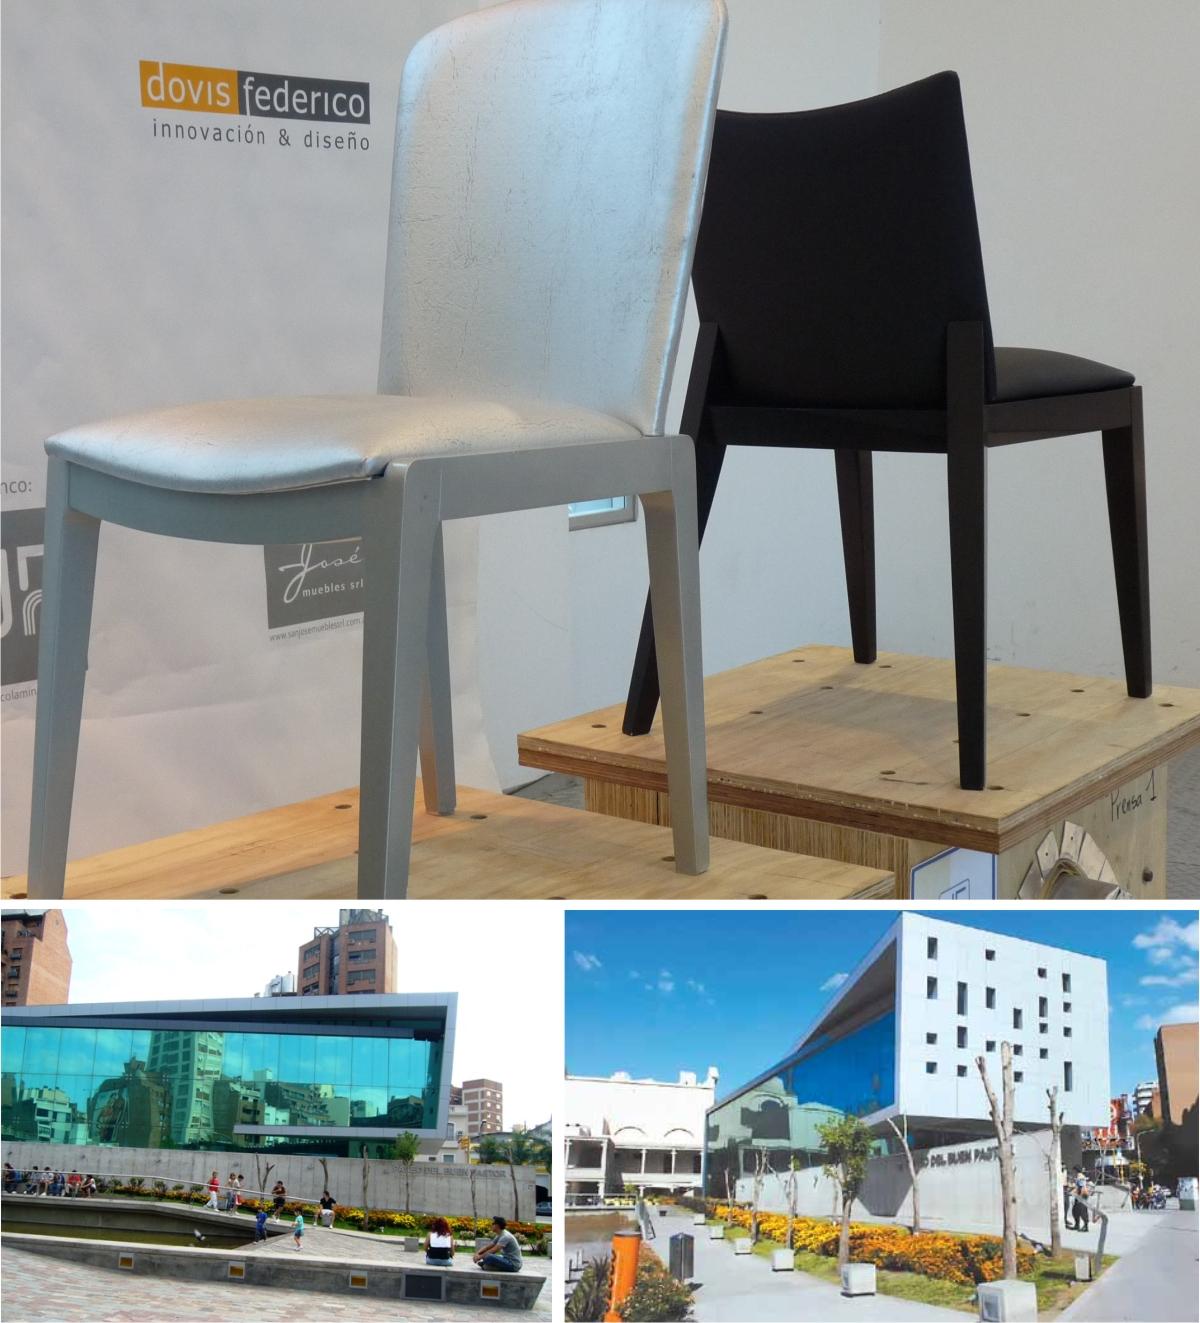 silla, sillas, dayer, san jose, buen pastor, salón austral, salon, expo, fimar 2012, multilaminado, diseño, argentina, córdoba, madera curvada, muebles, mobiliario, equipamiento